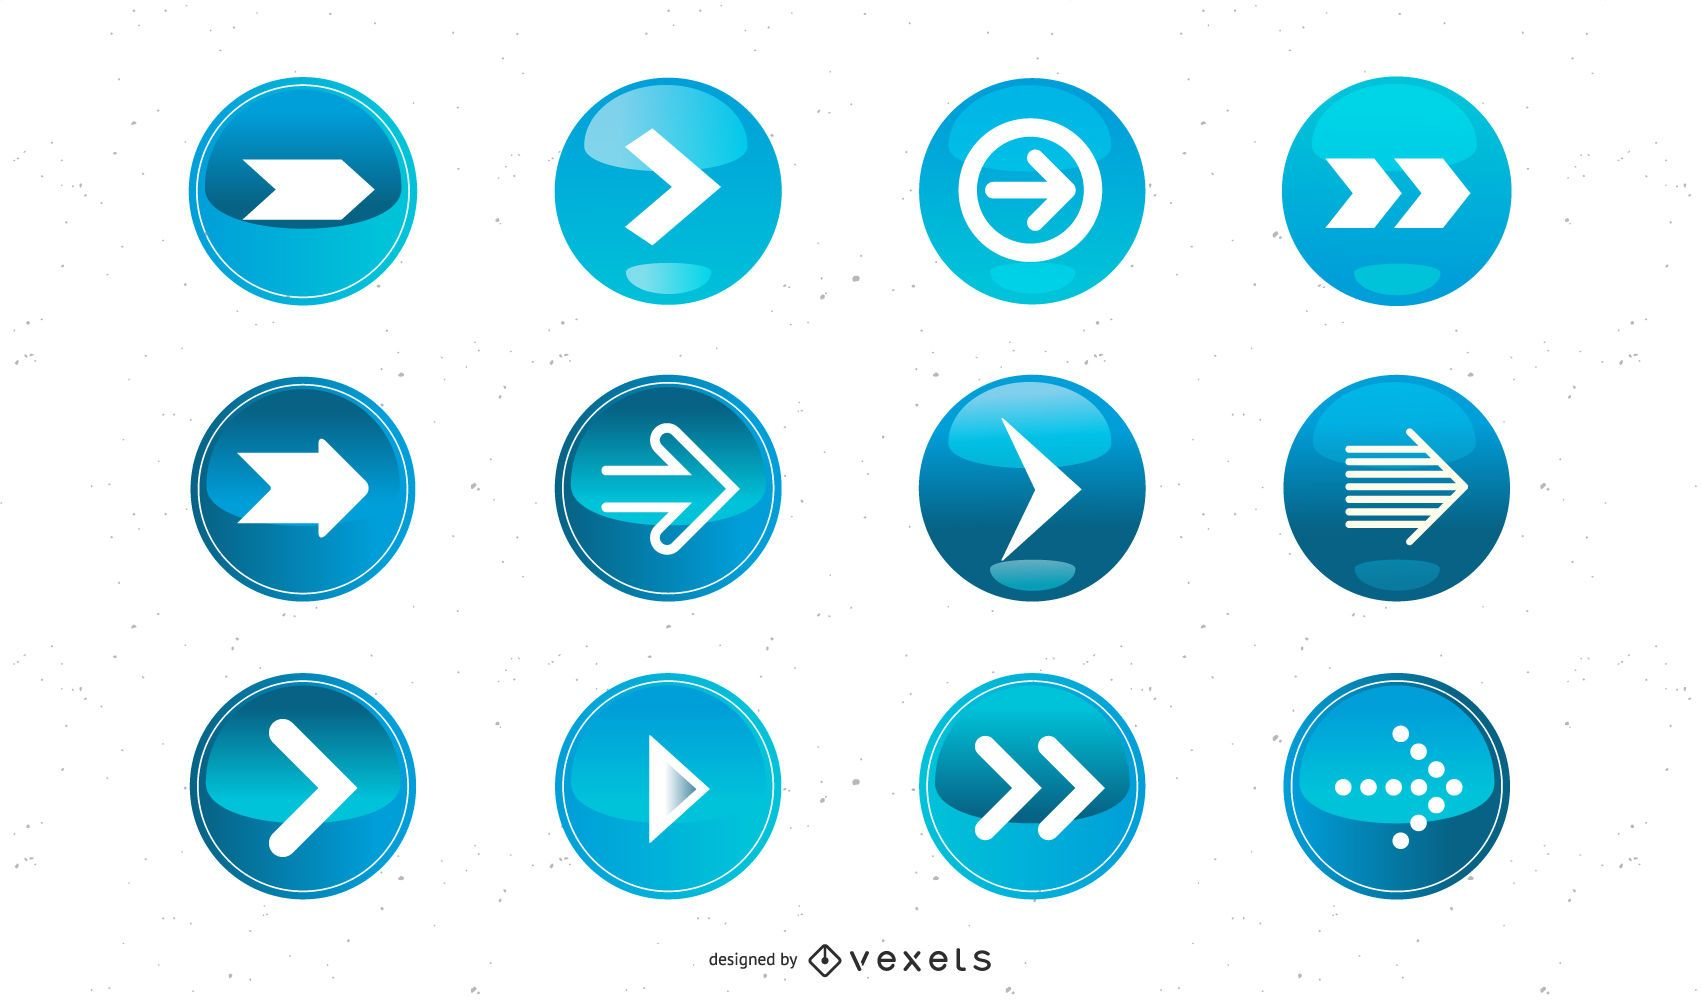 Paquete de flechas 3D en azul brillante